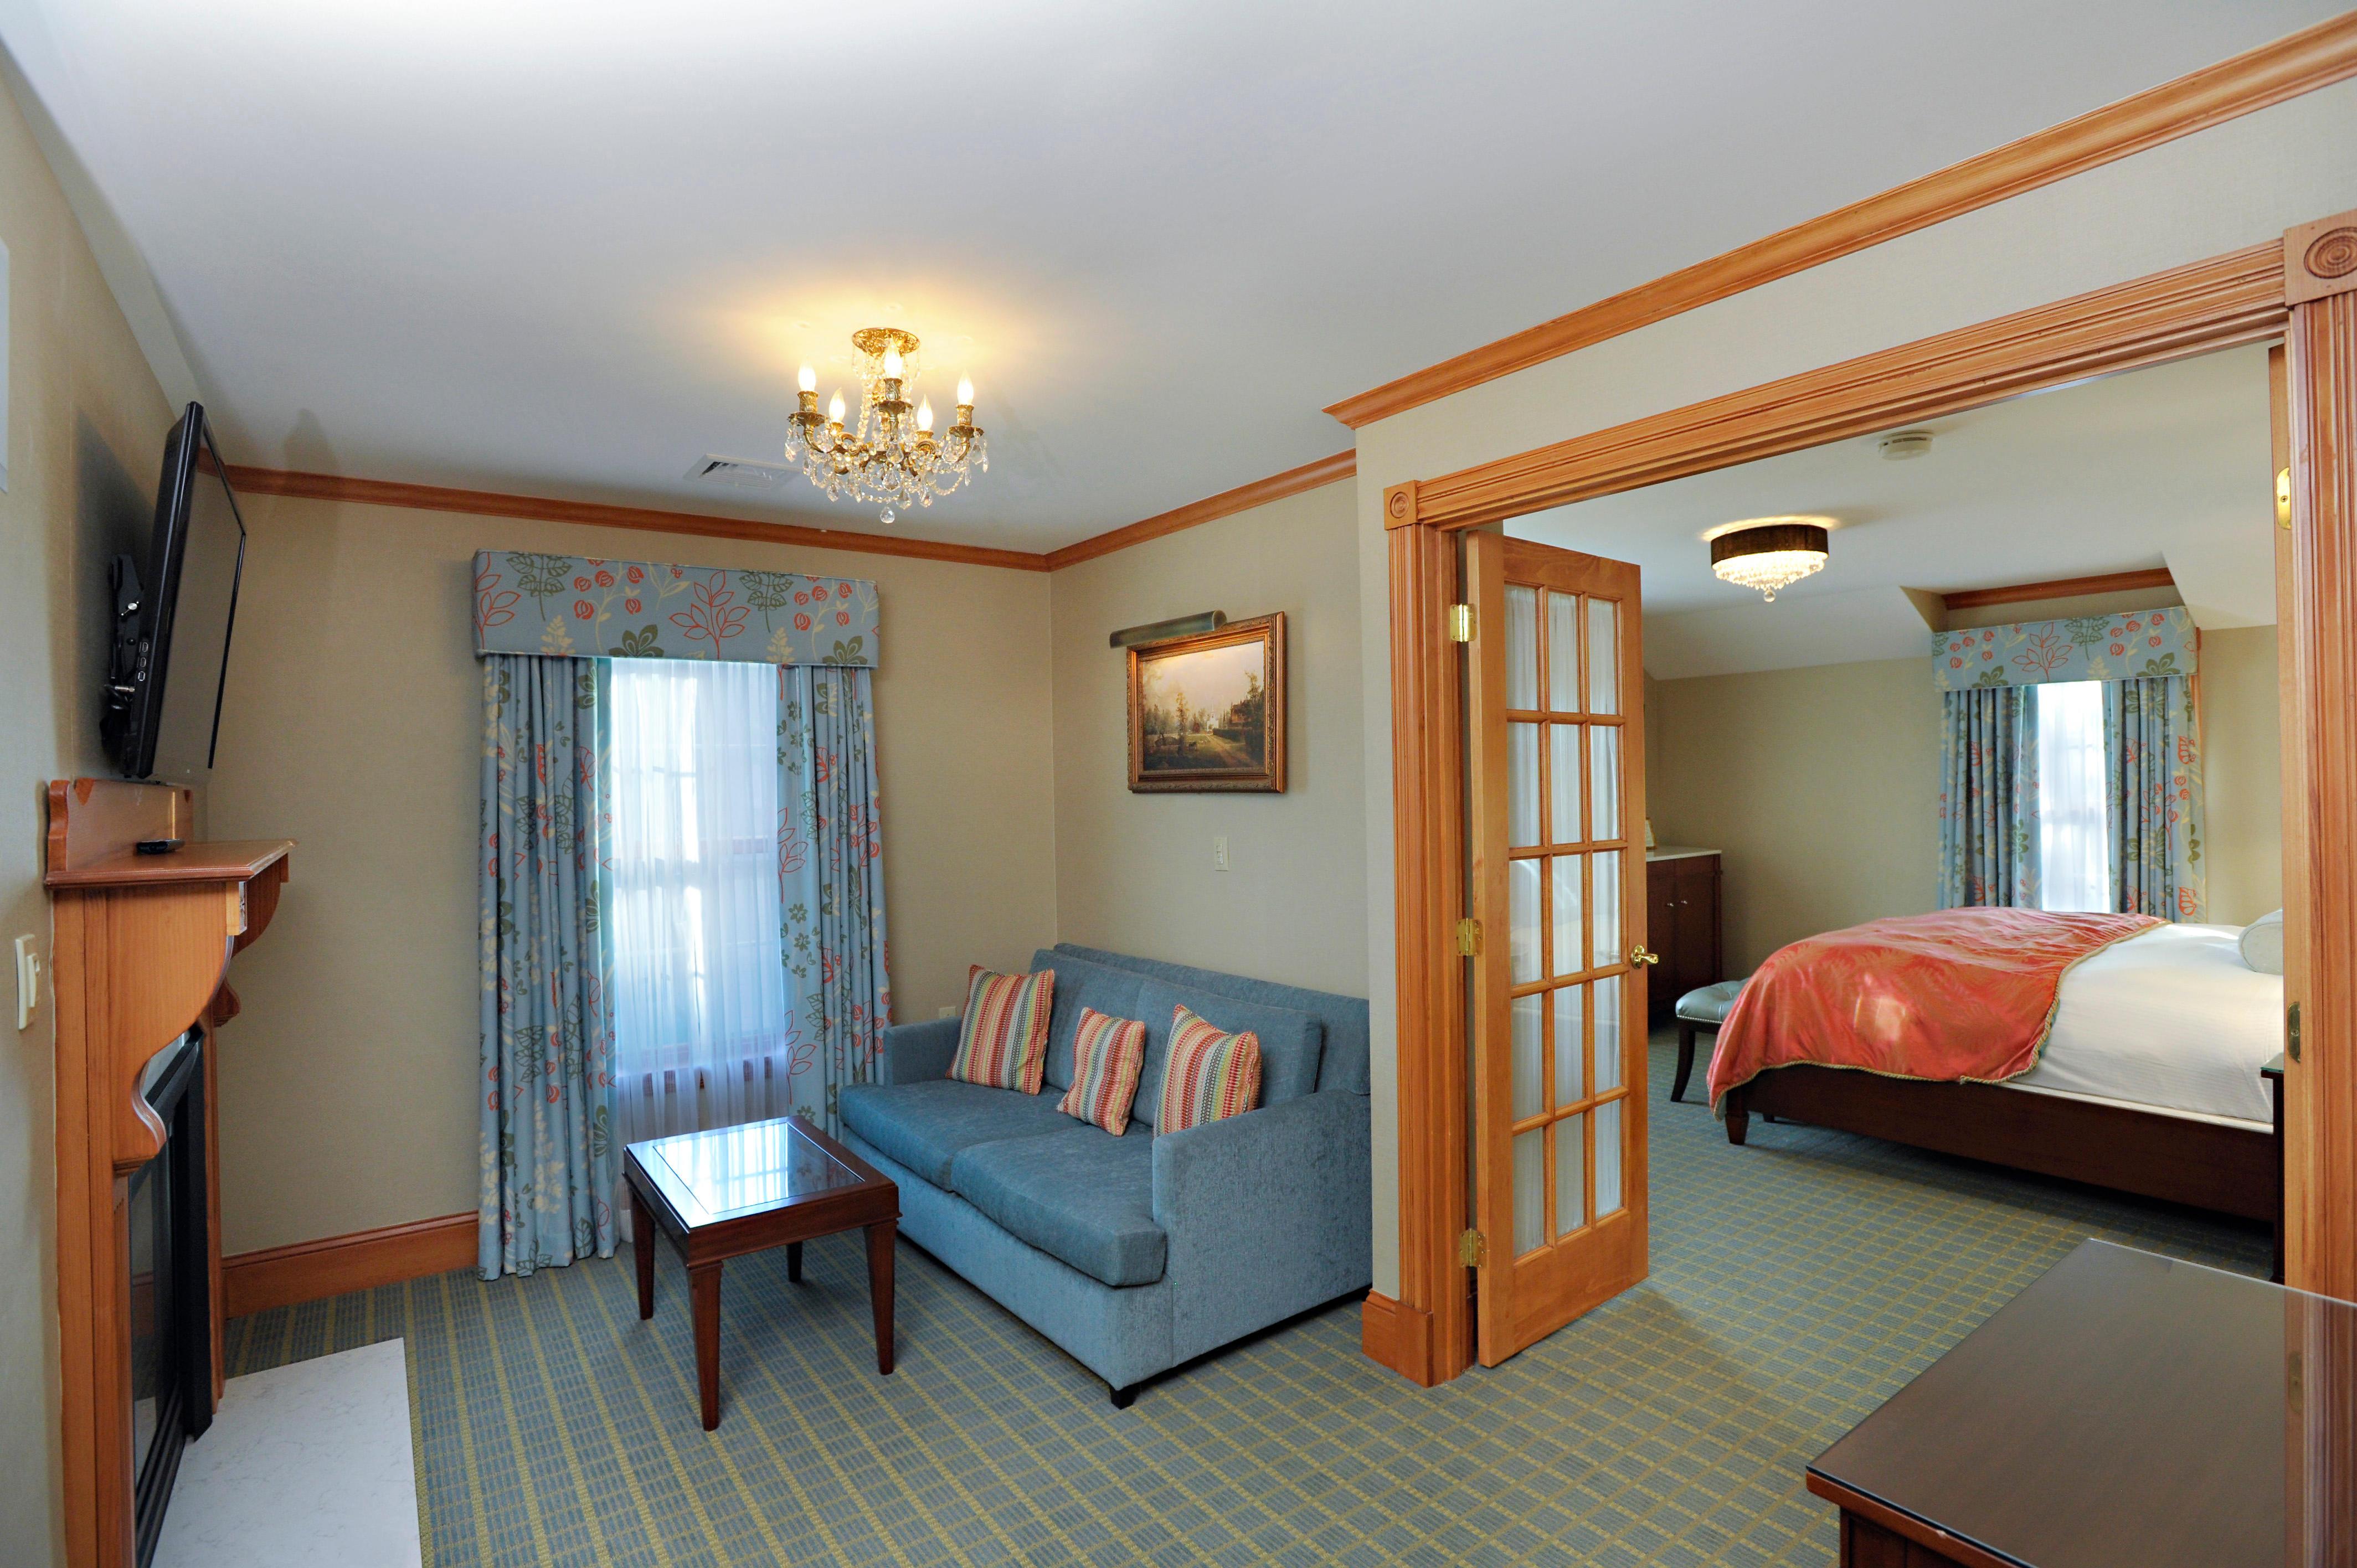 The Wentworth Inn image 4